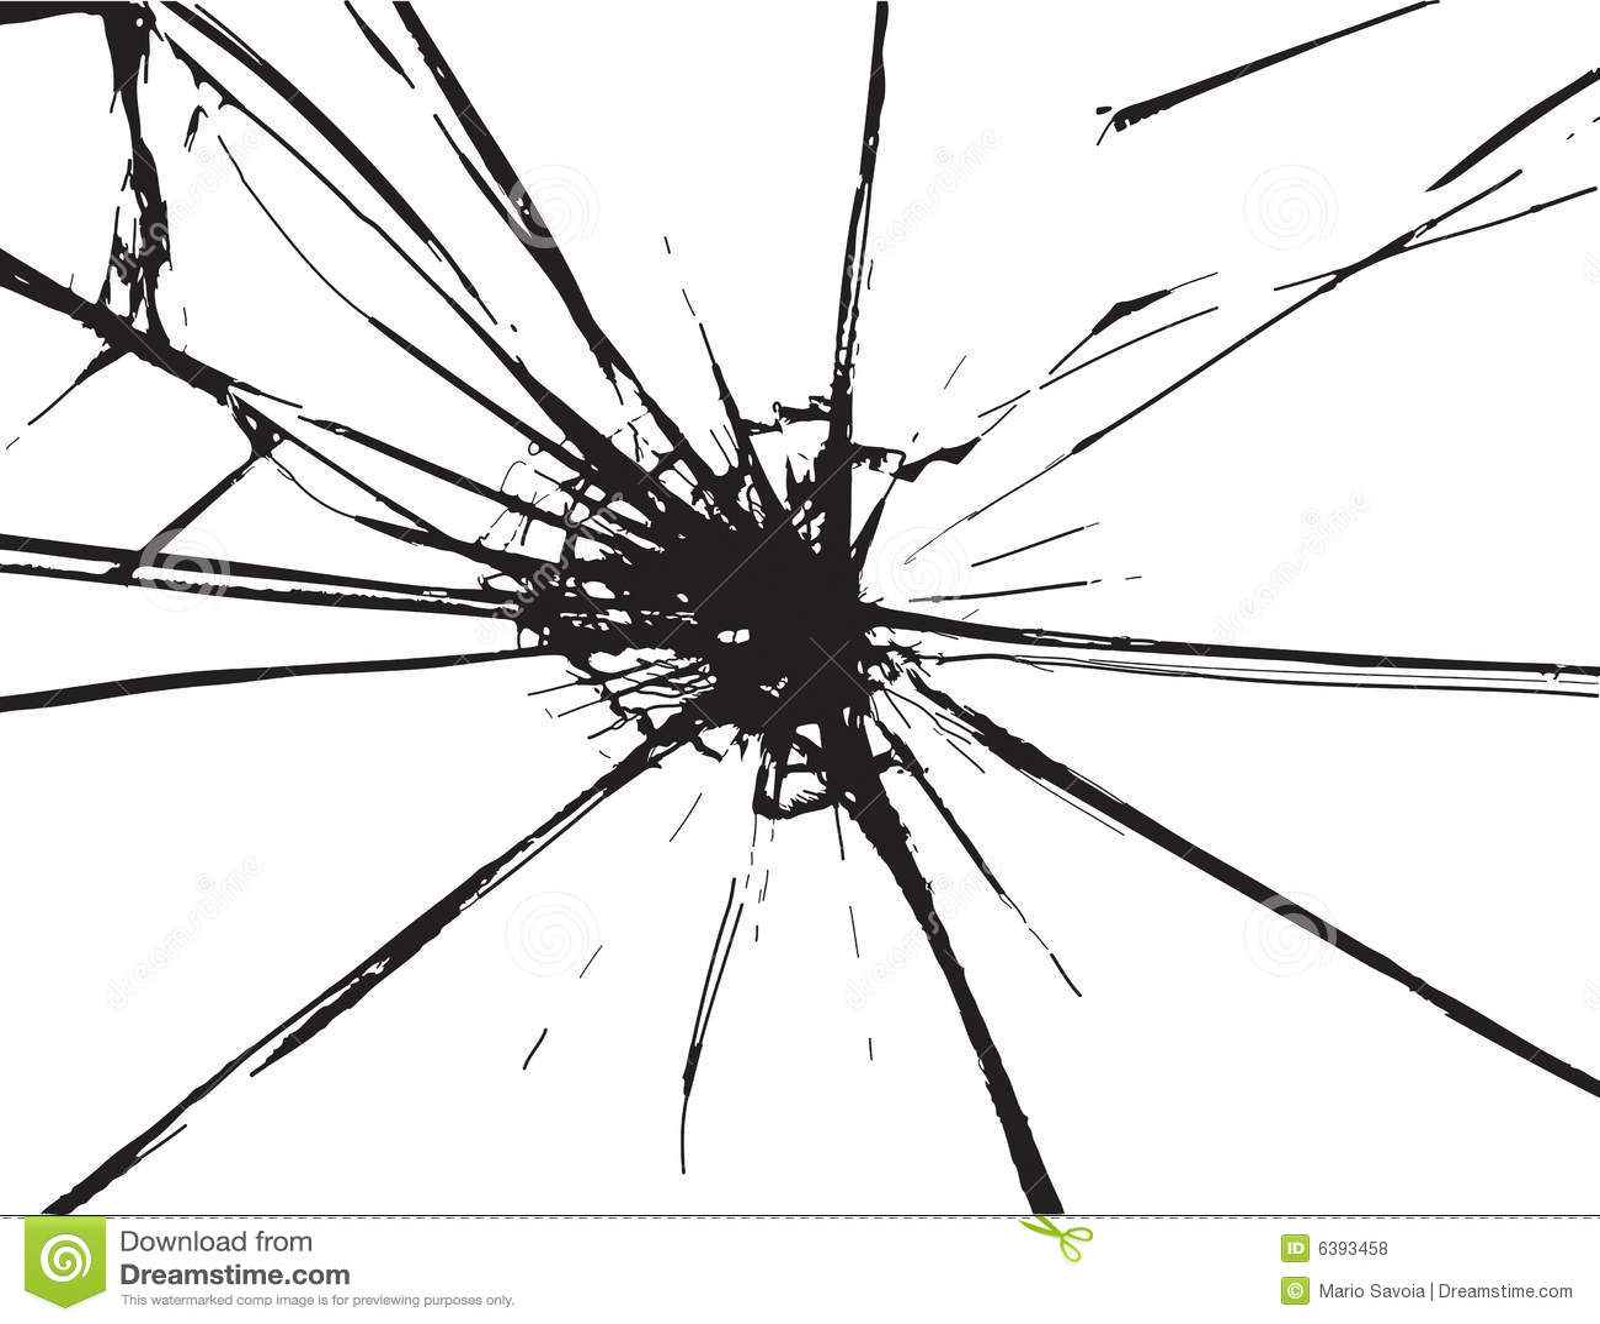 Broken glass stock vector illustration of background 6393458 broken glass voltagebd Gallery